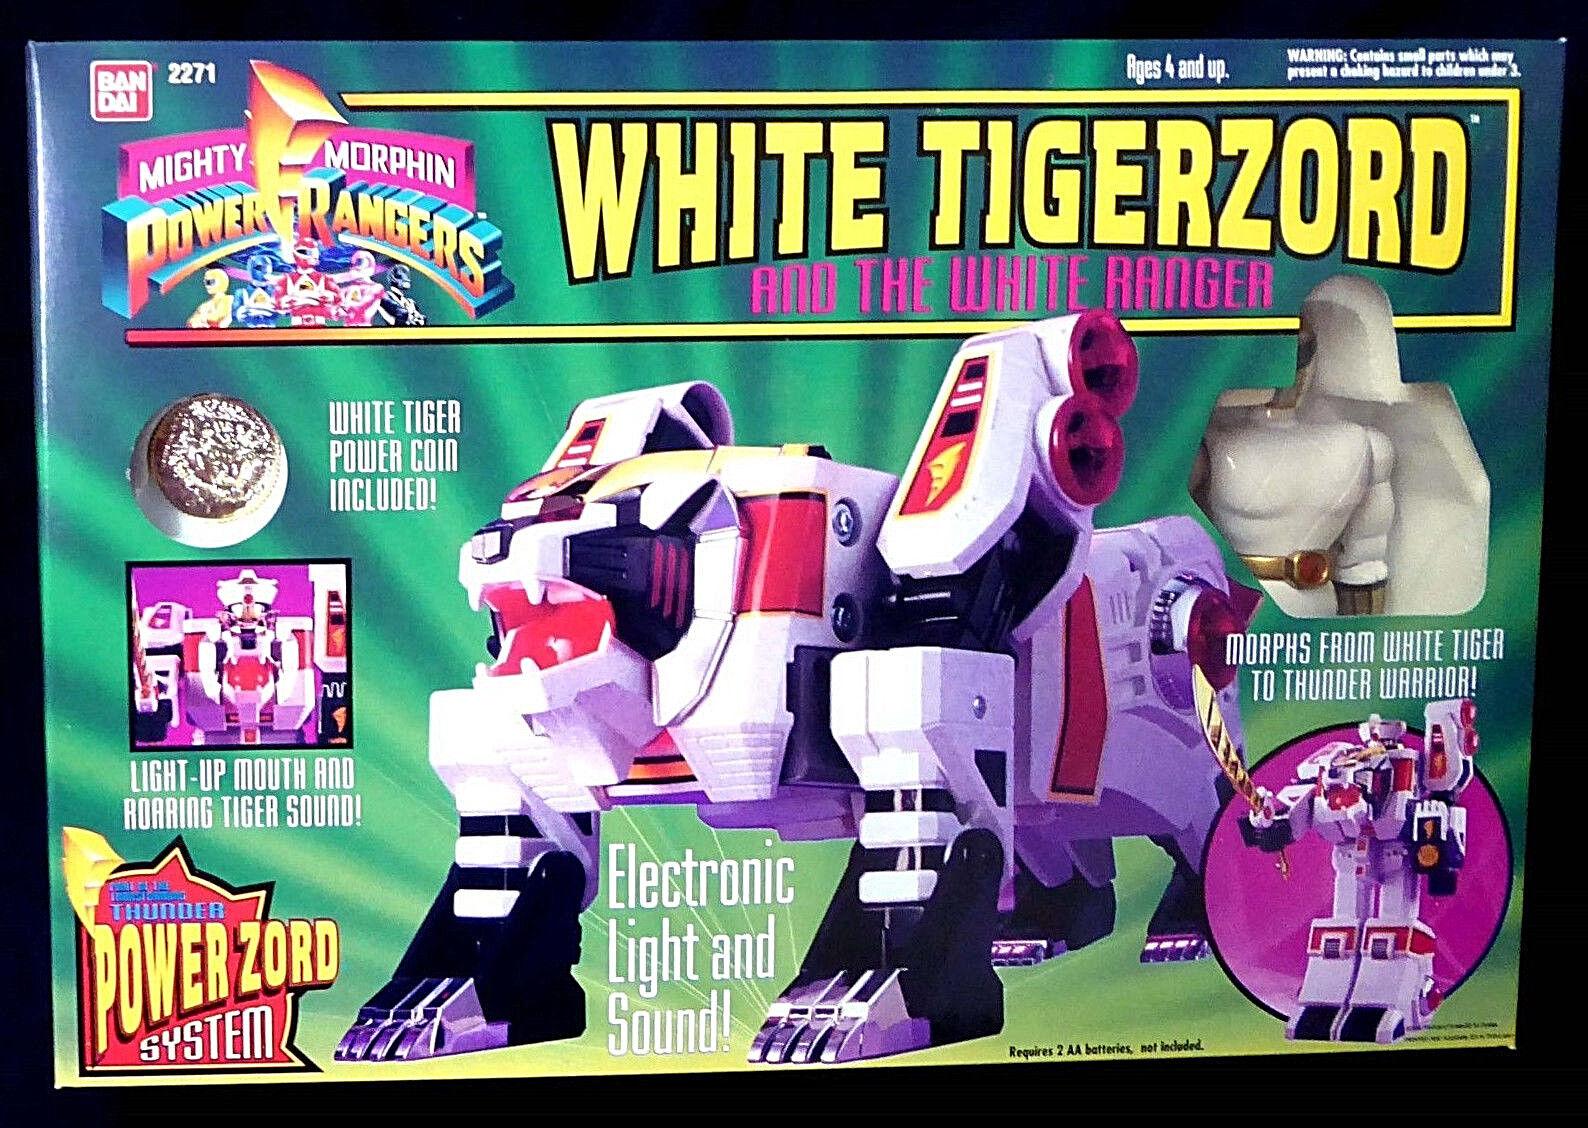 Morphin Power Rangers Weiß Tigerzord with Weiß Ranger 2271 MIB Bandai 1994